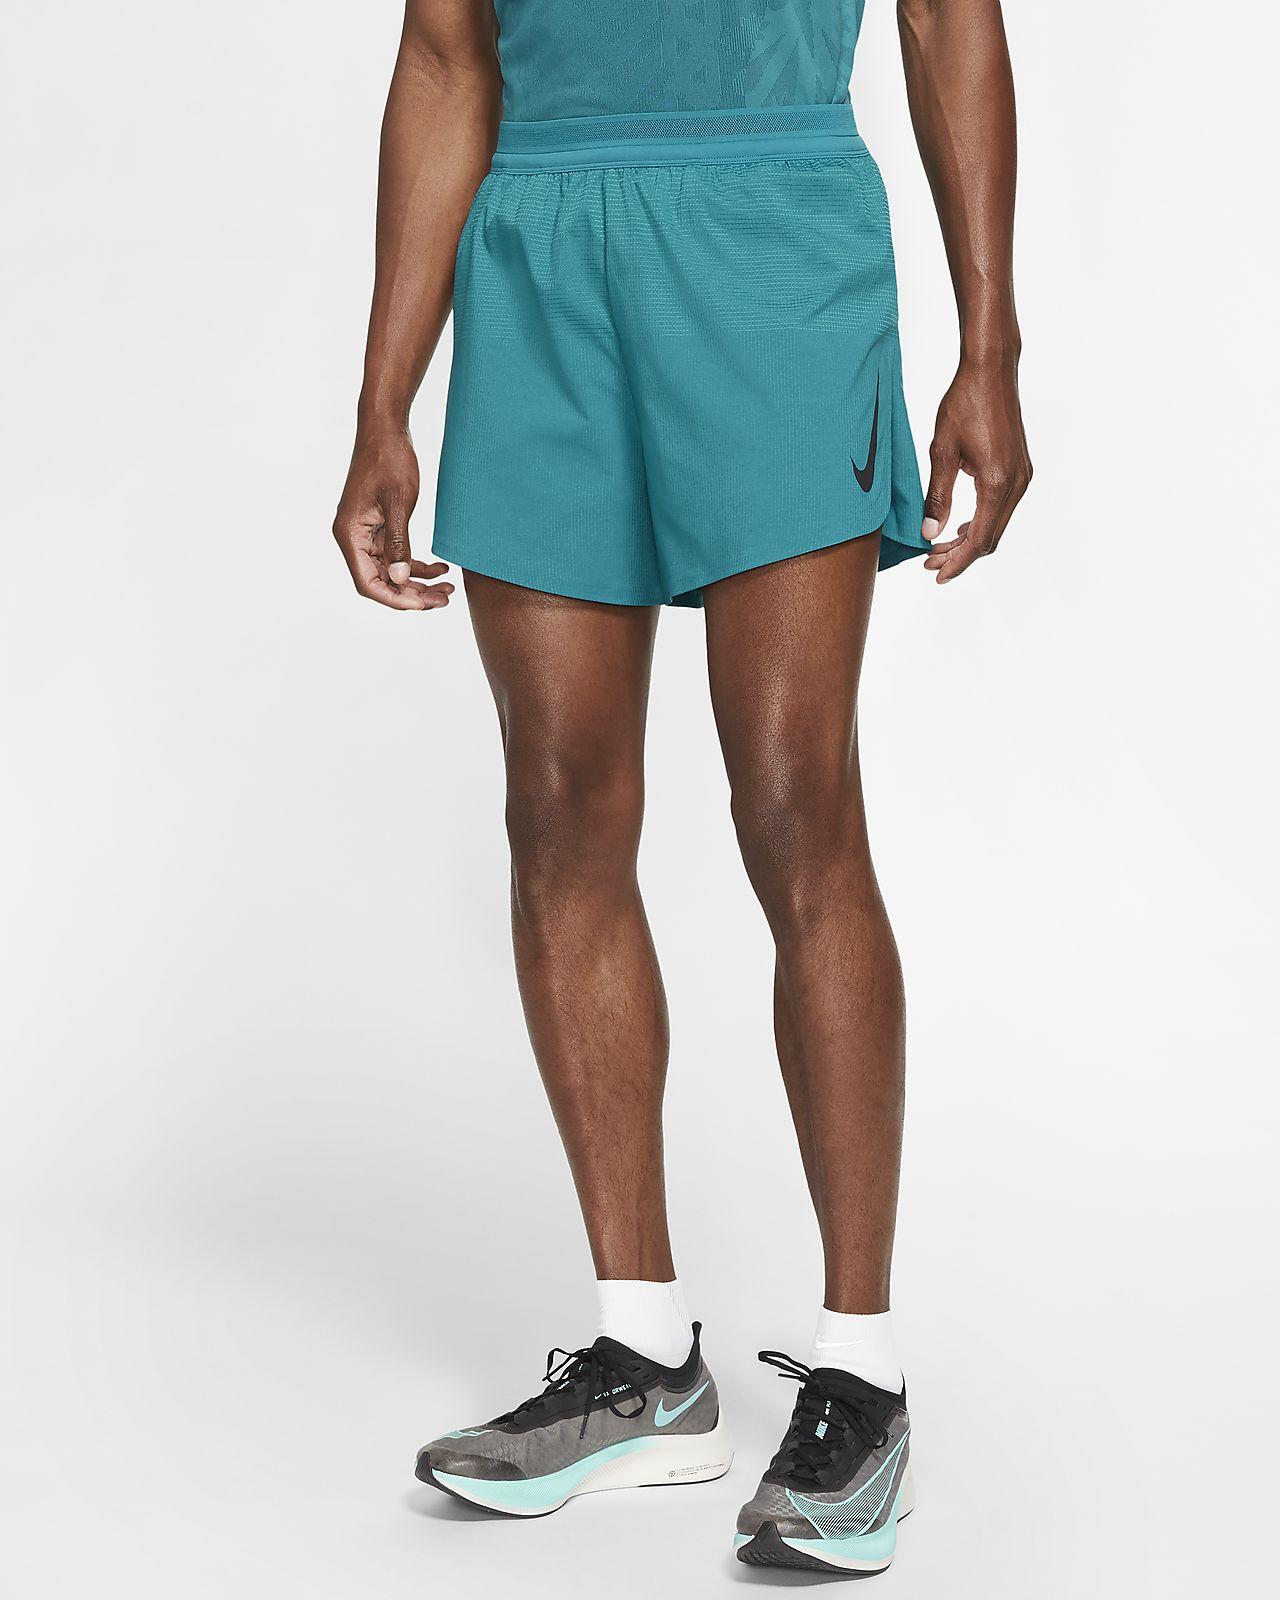 Nike AeroSwift Men's 13cm (approx.) Running Shorts